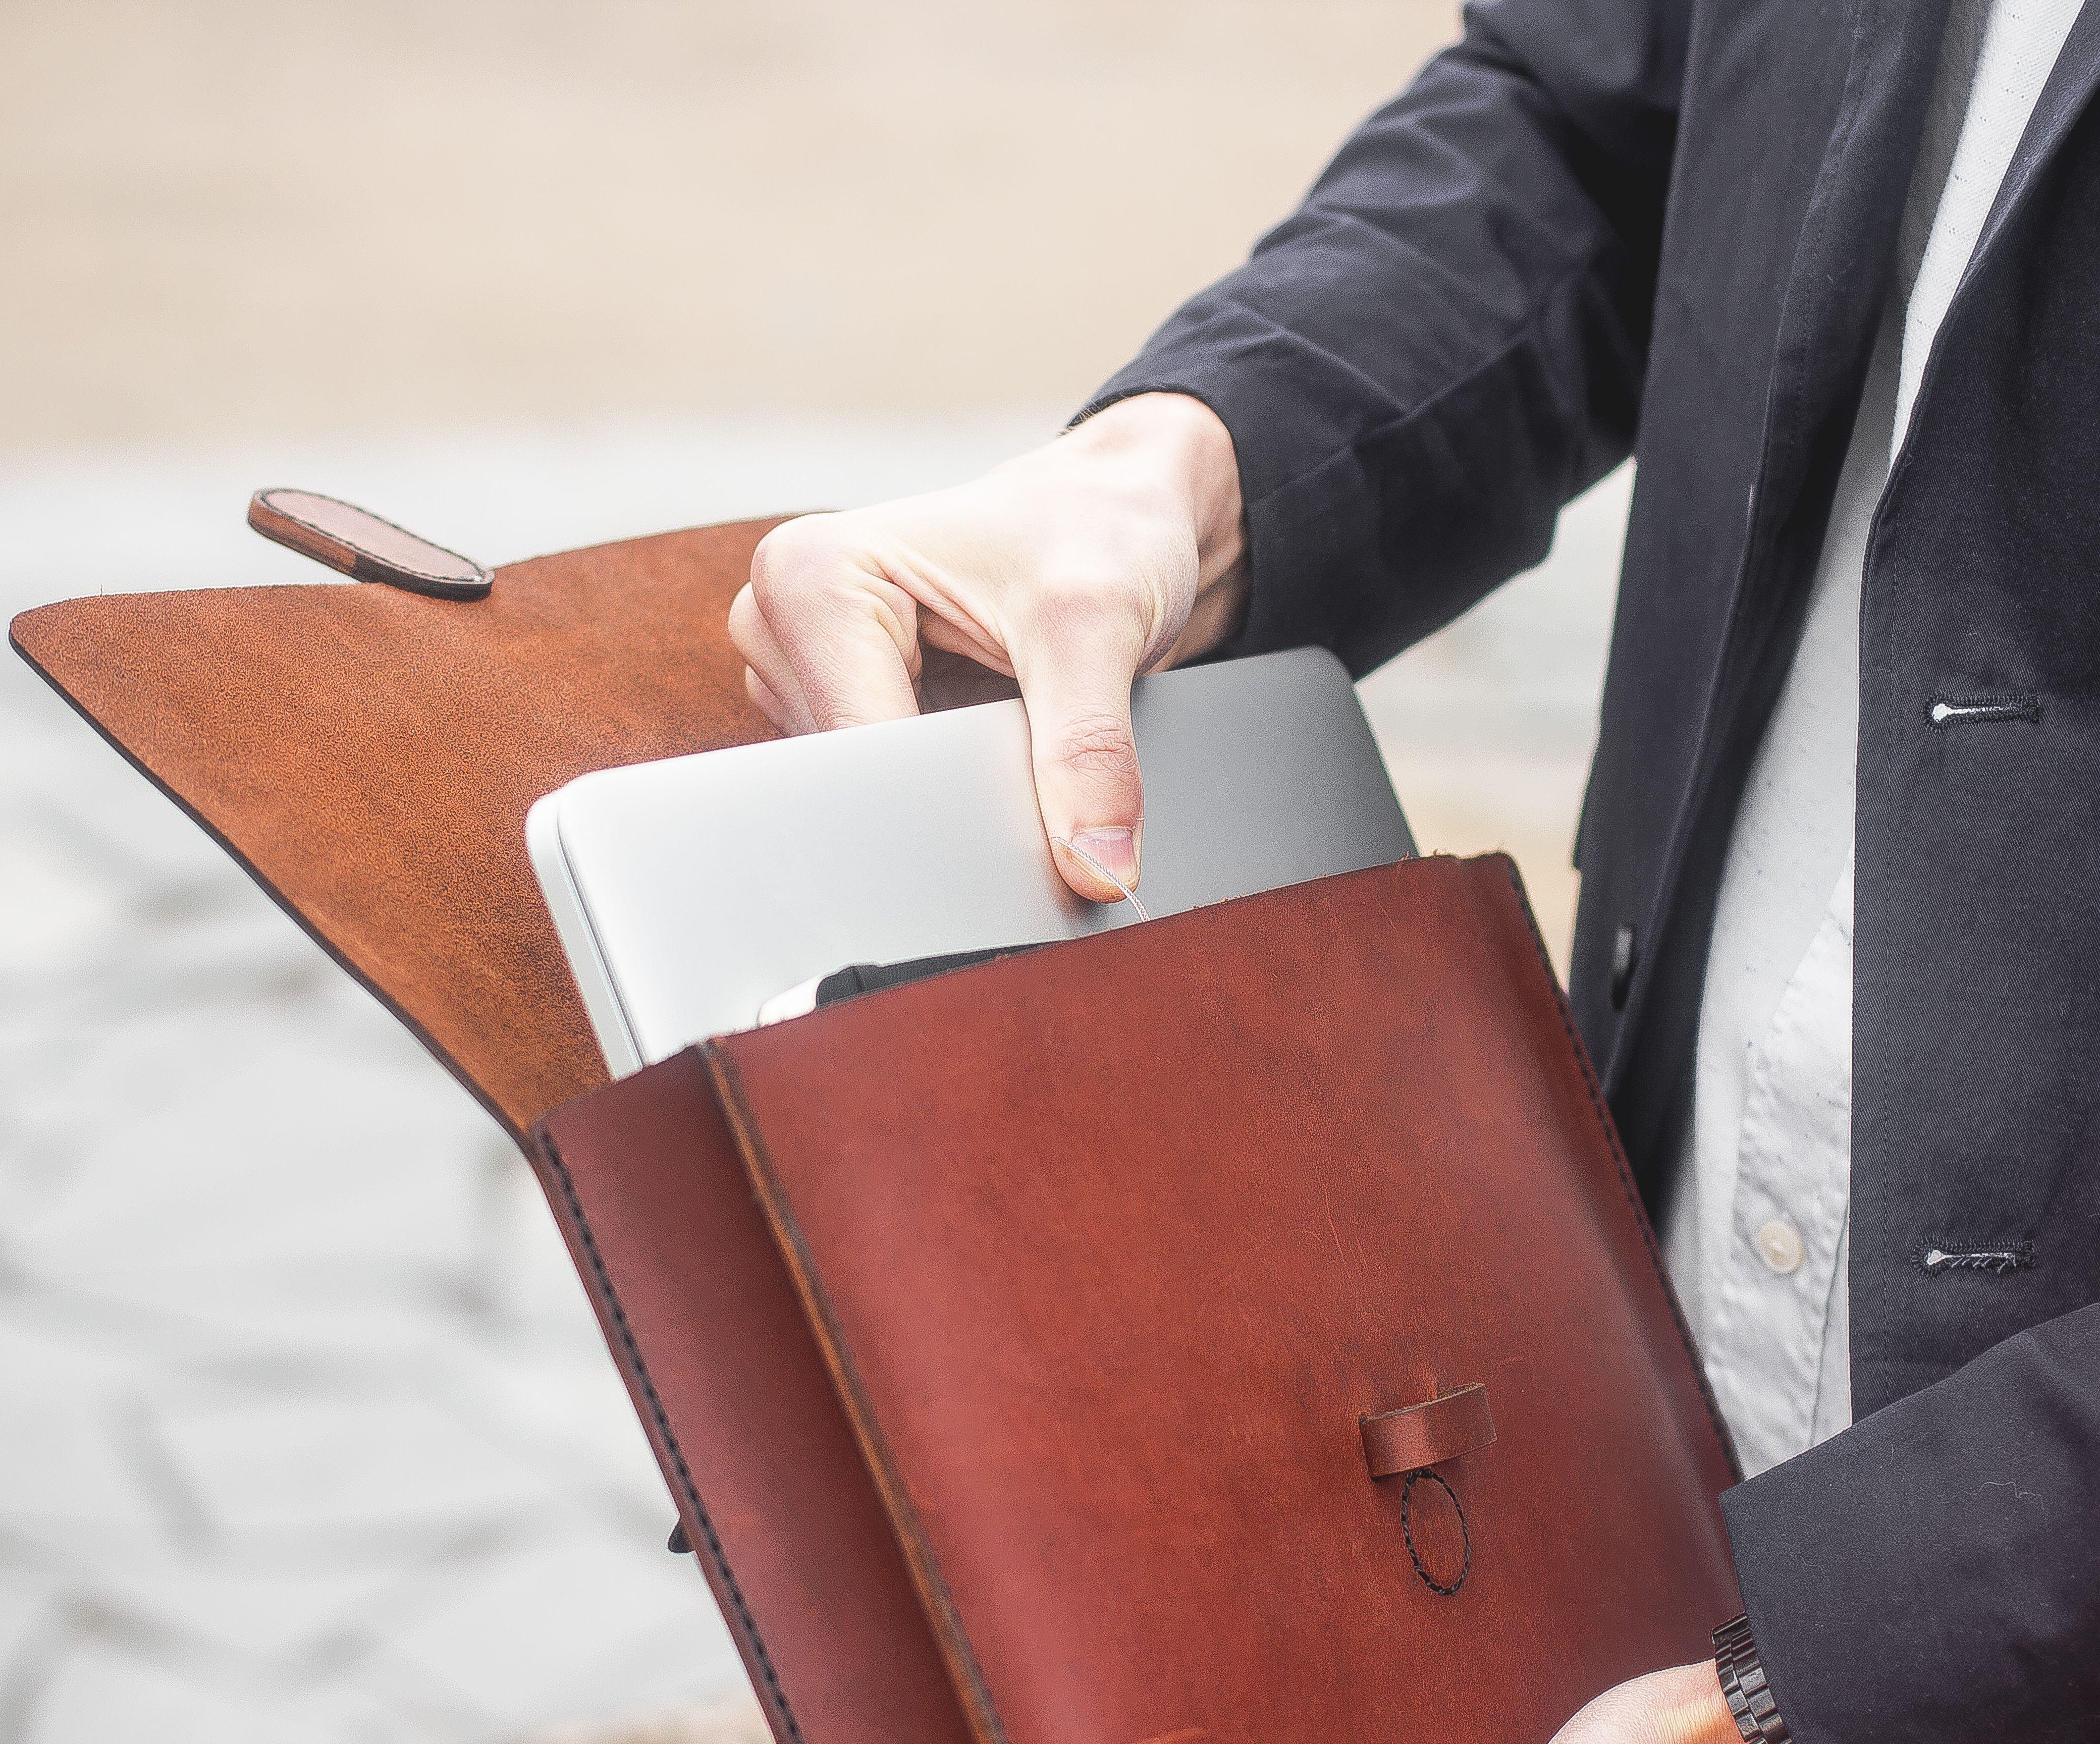 Pc holder handmade made in Italy. Leather folder bag leather briefcase document holder Messenger bag